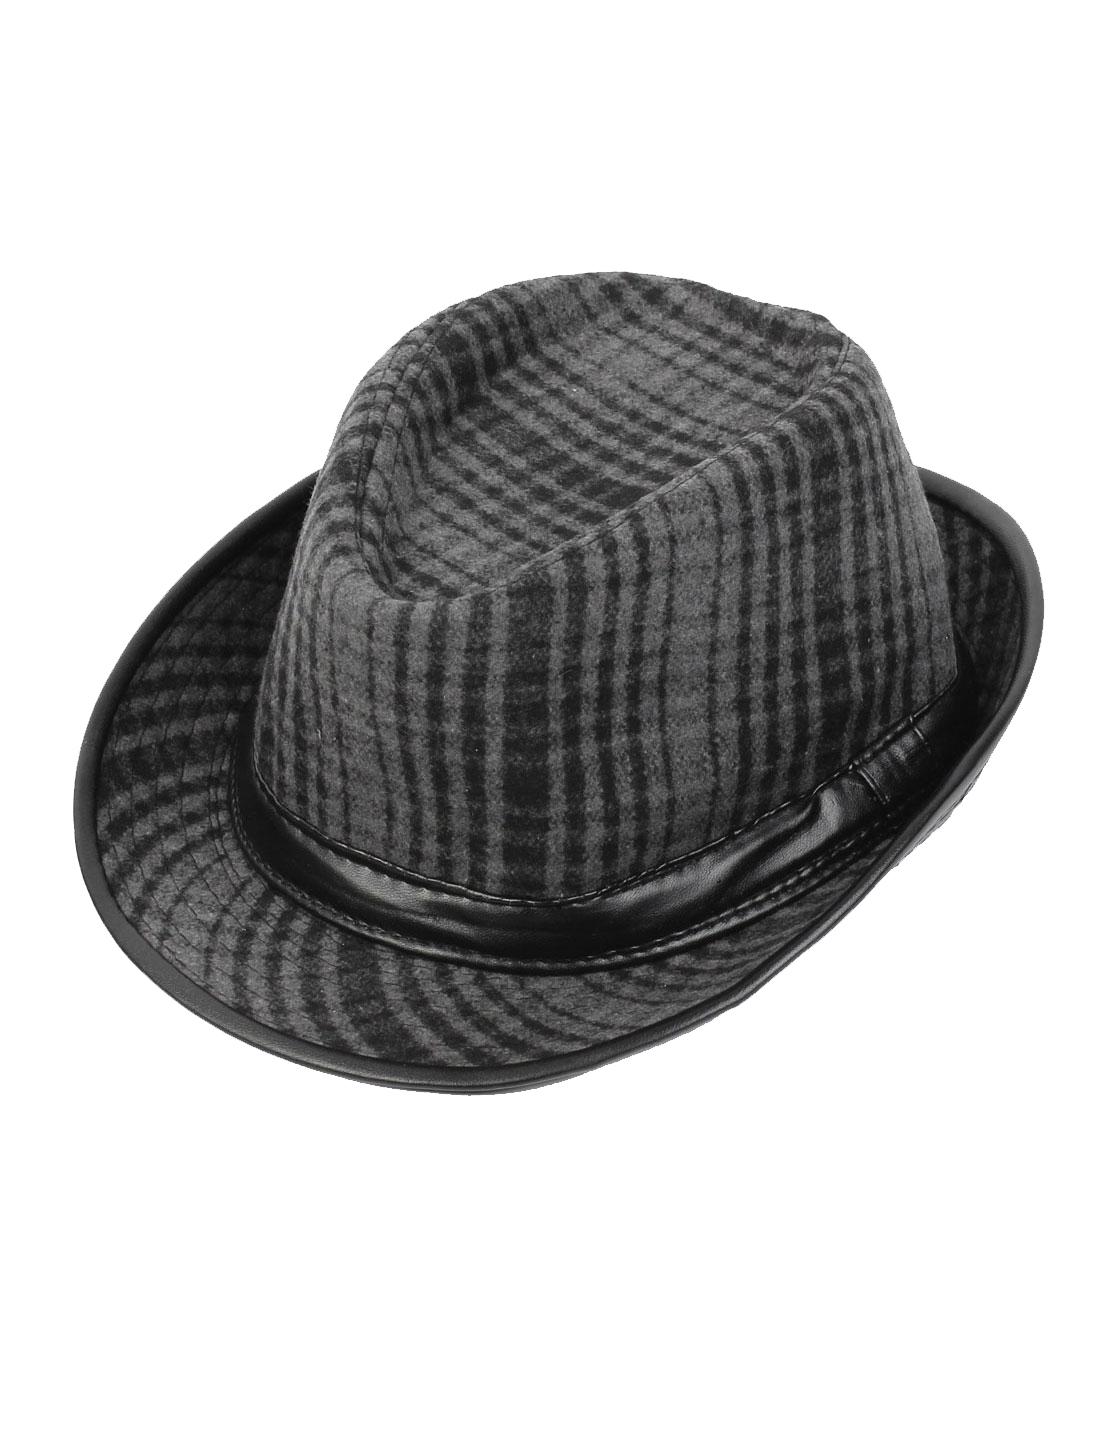 Man Faux Leather Band Decor Checker Pattern Black Gray Fedora Hat